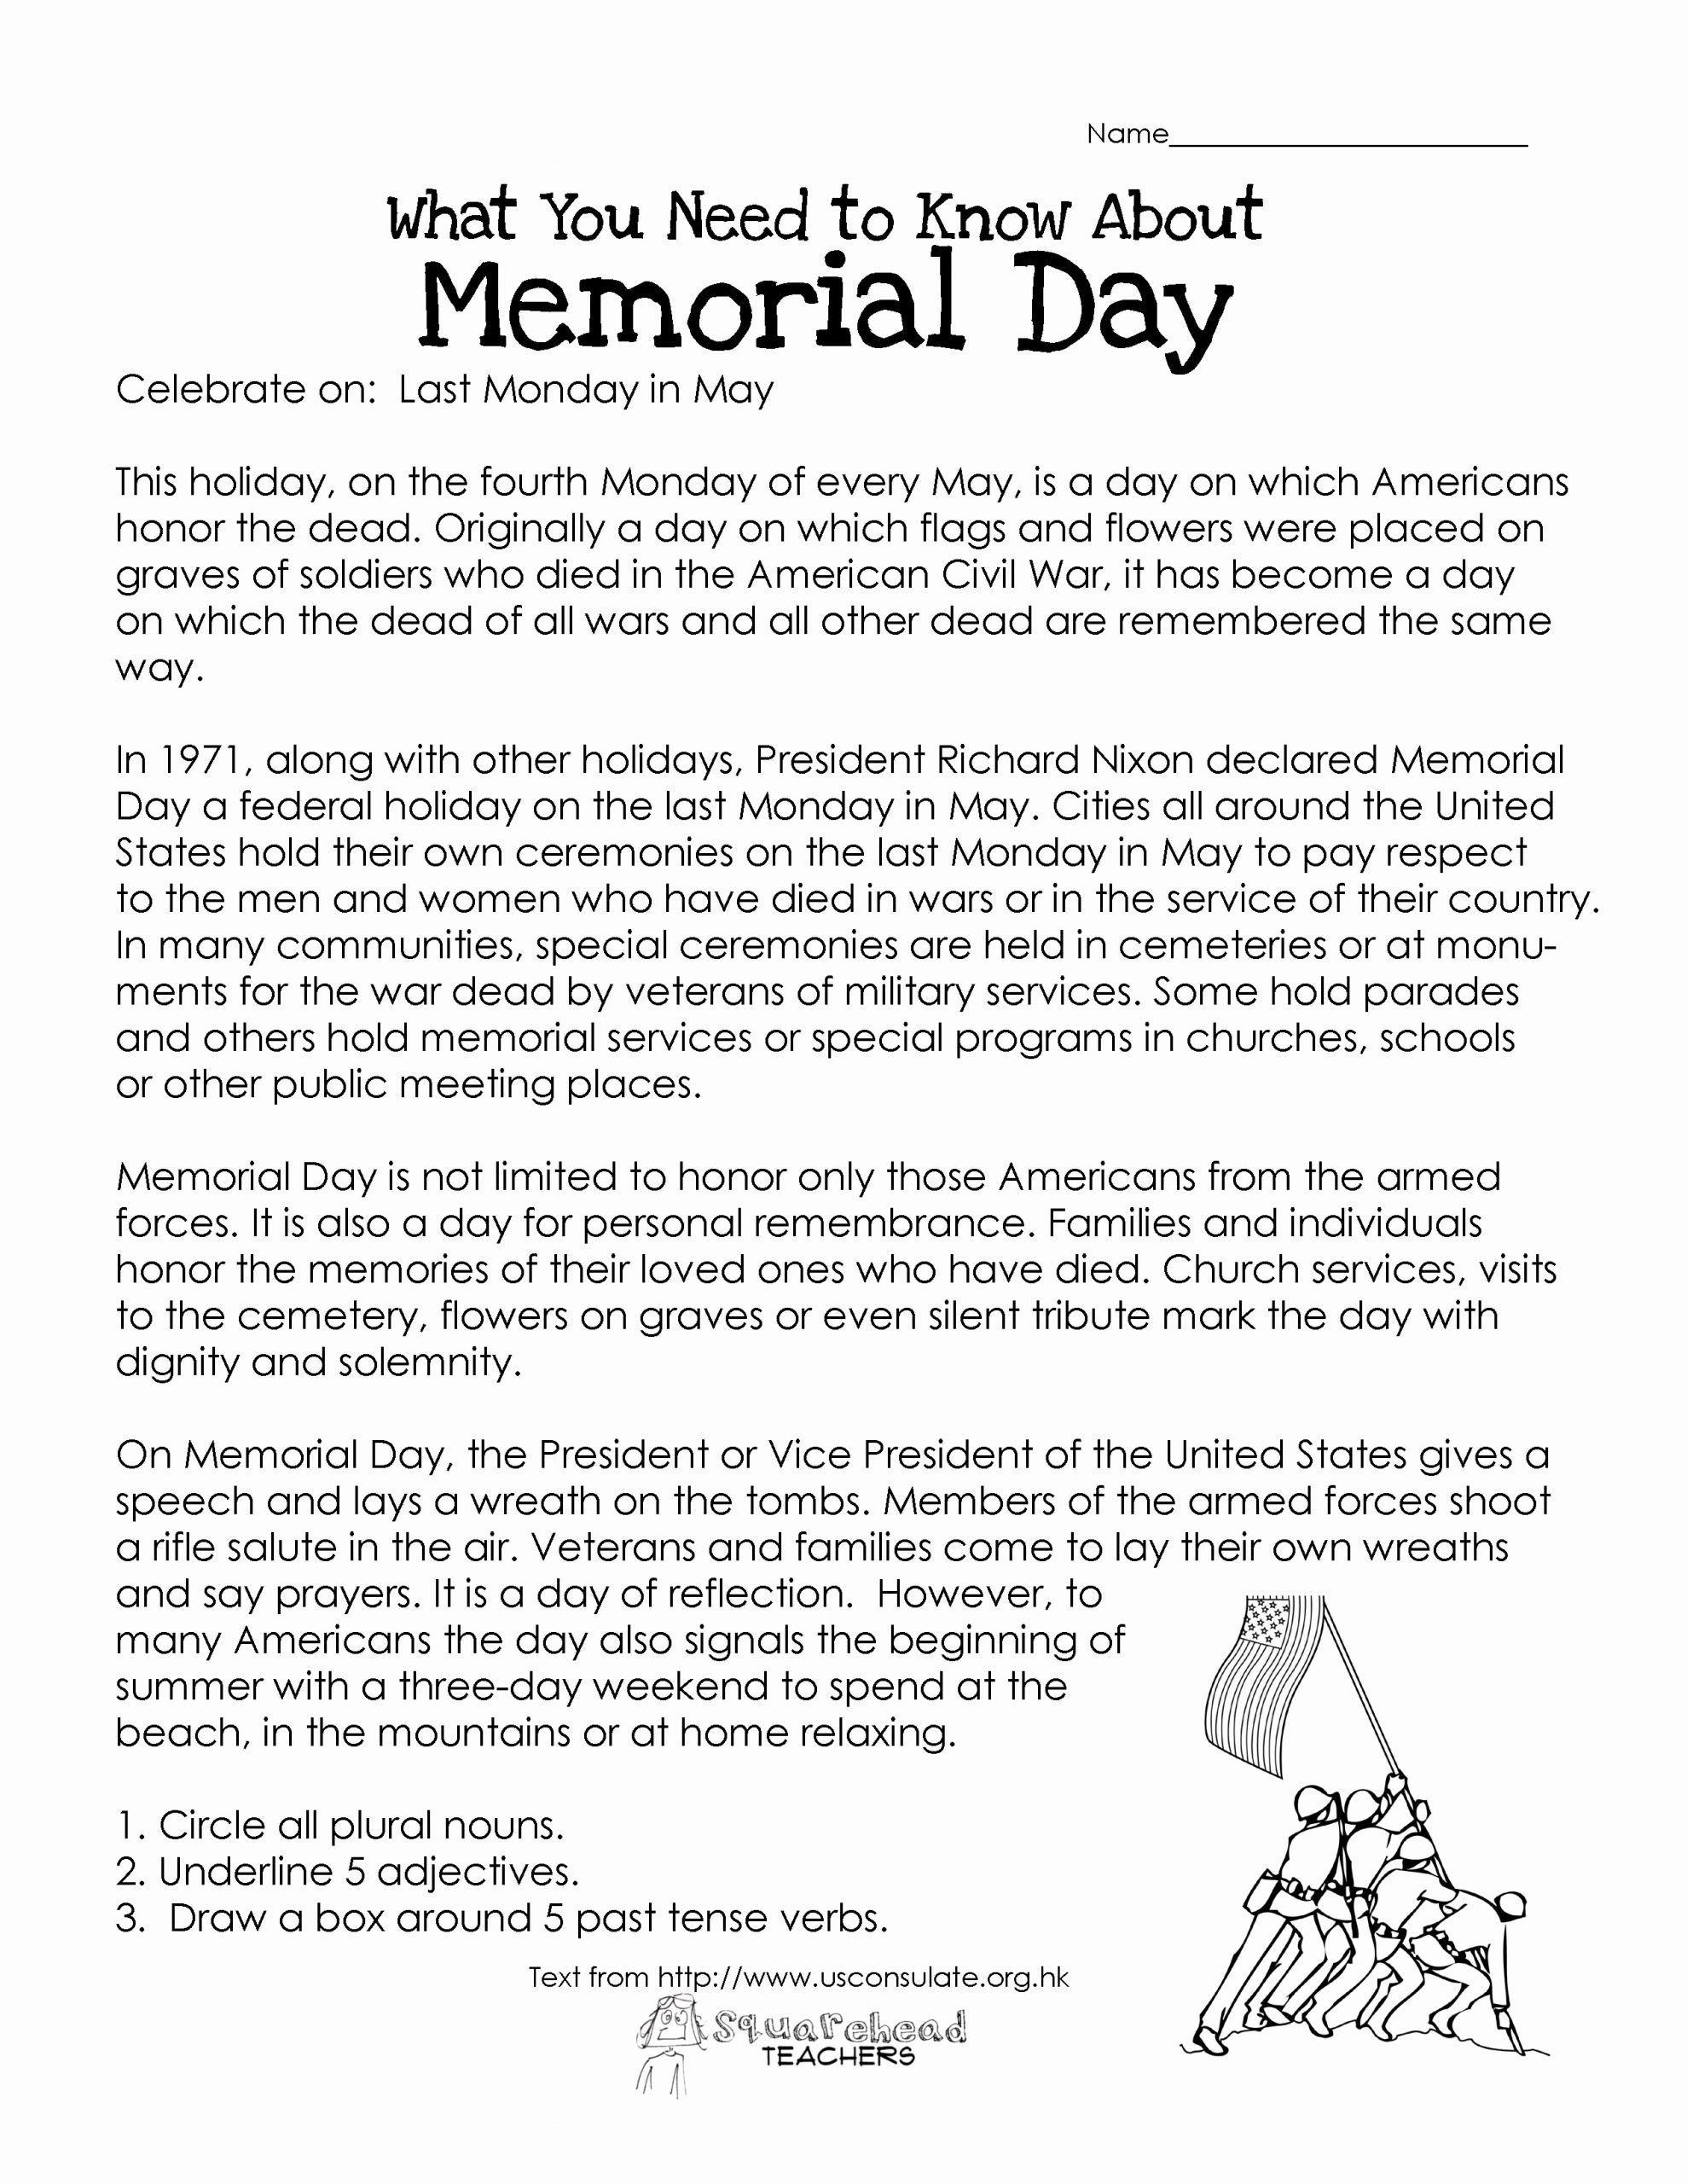 Memorial Day Worksheets First Grade Lovely Memorial Day Free Worksheet